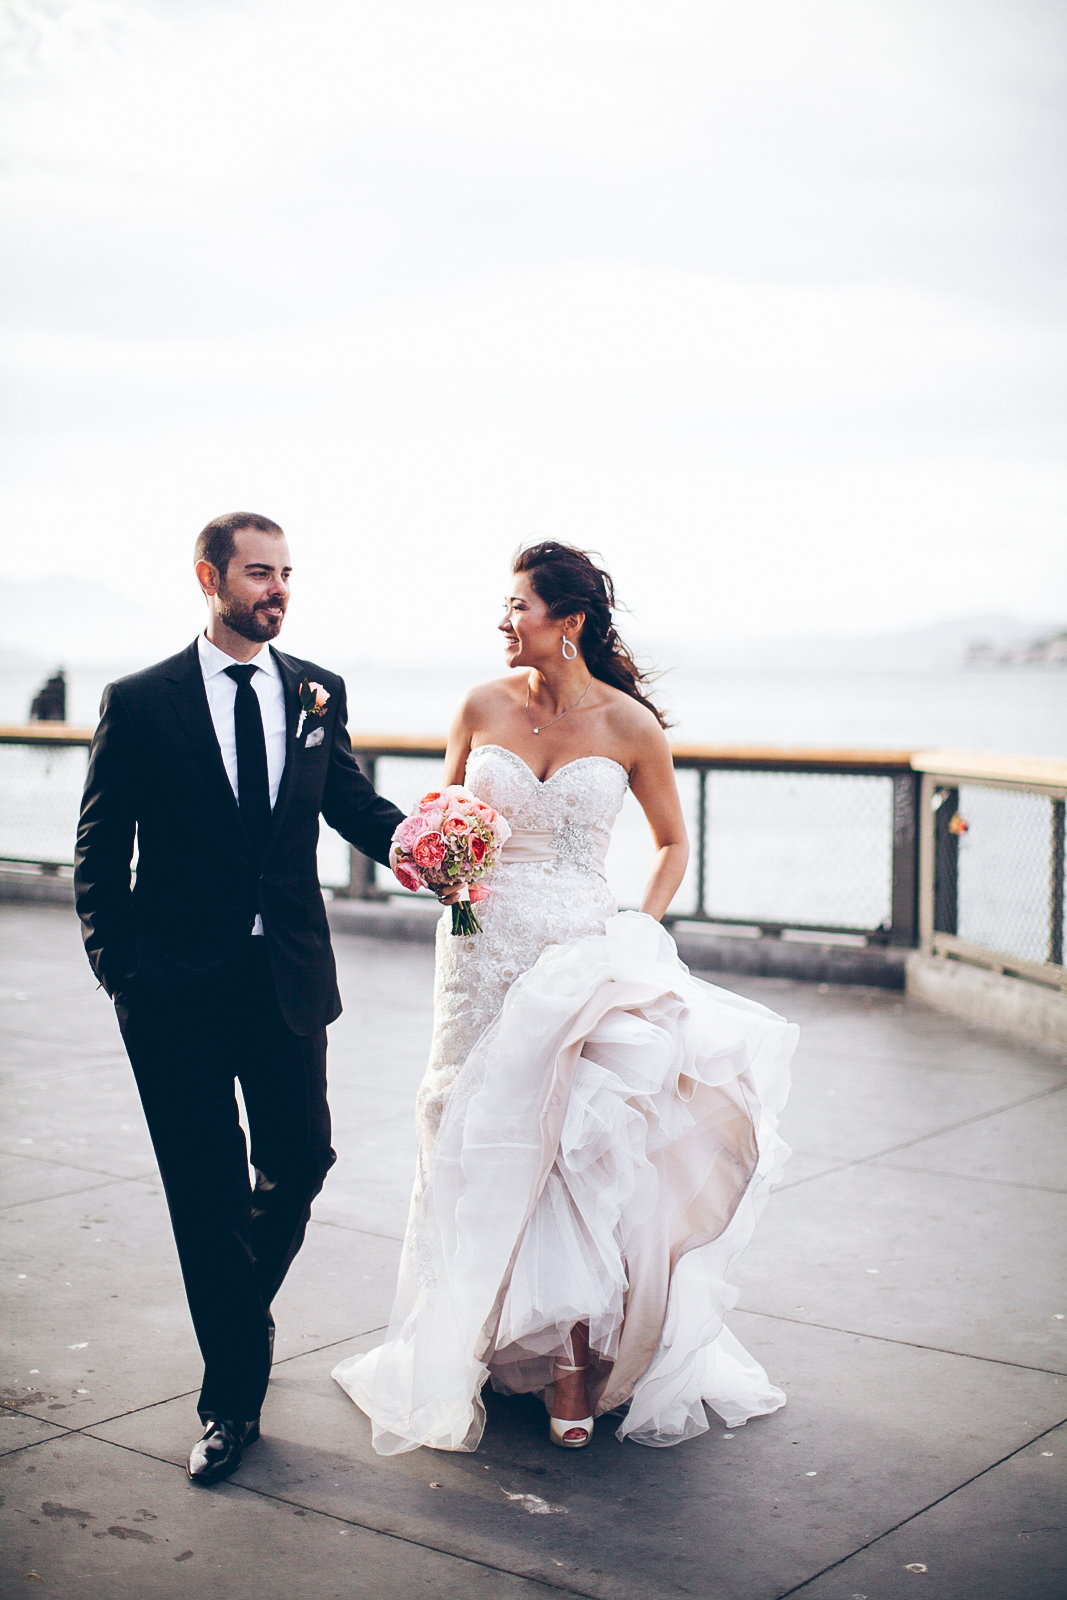 San_francisco_city_hall_wedding_photography_meegan_travis_ebony_siovhan_bokeh_photography_87.jpg